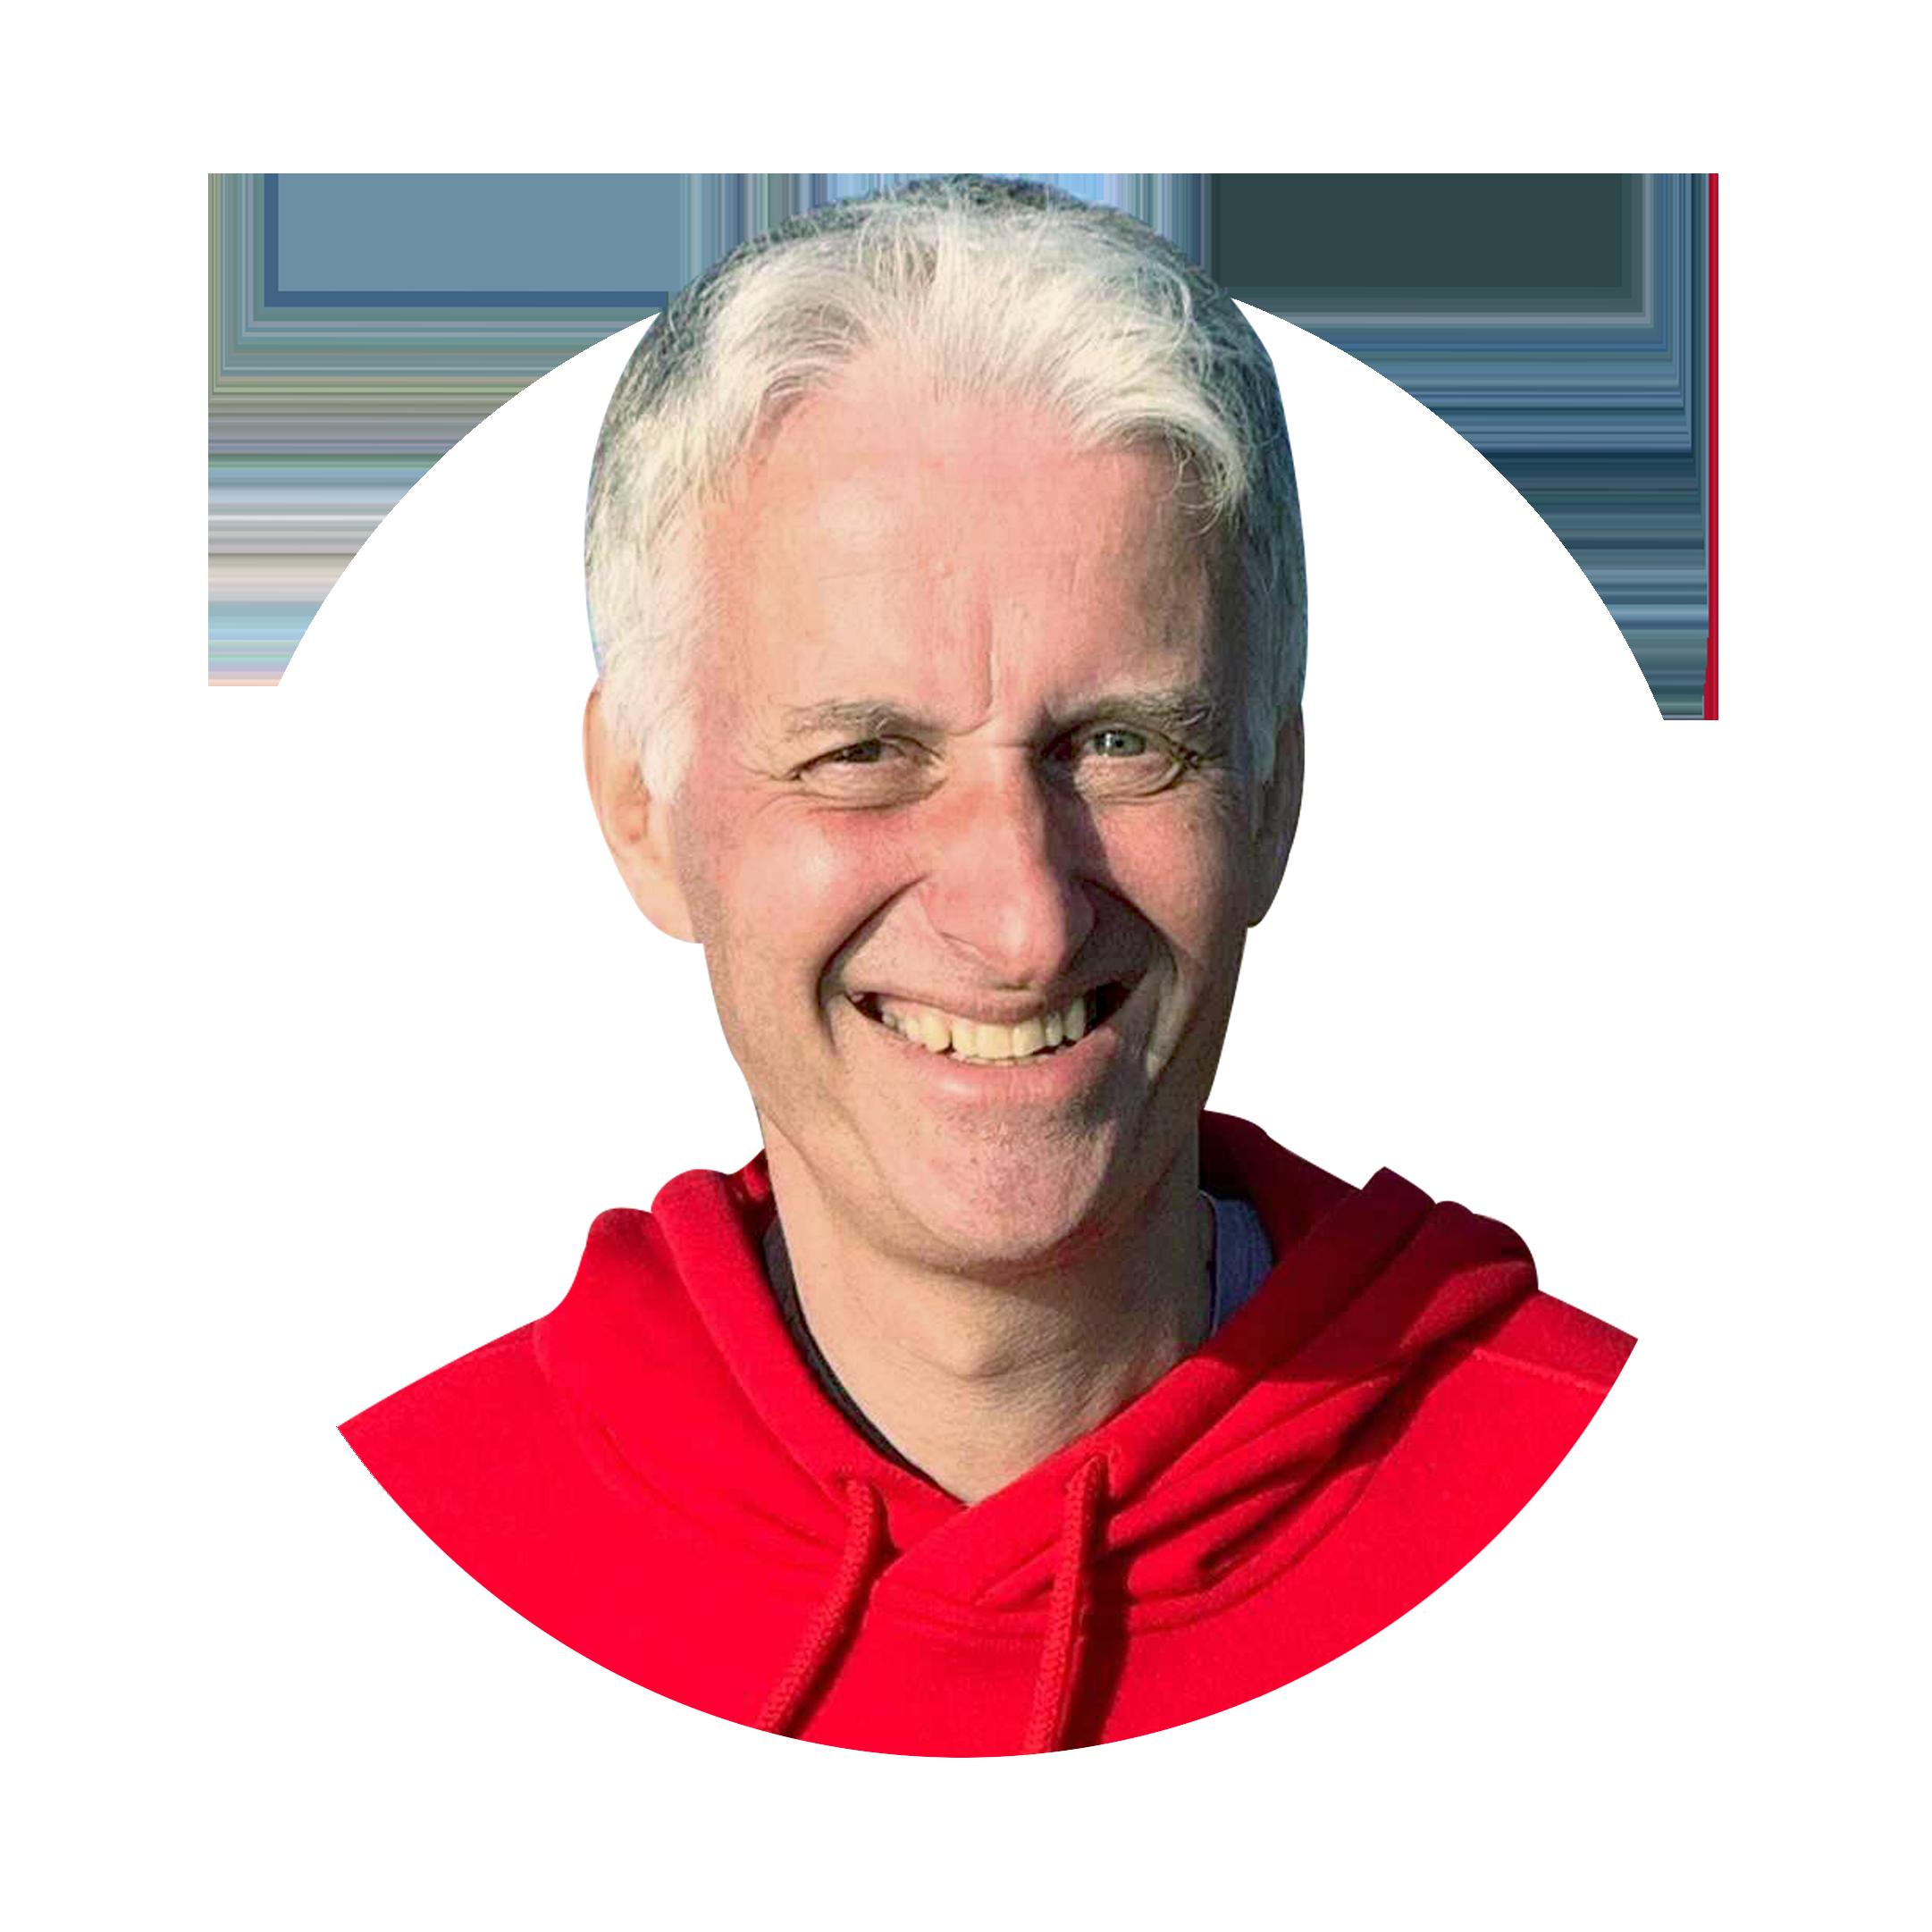 Sidekick profile Olivier Hertoghe